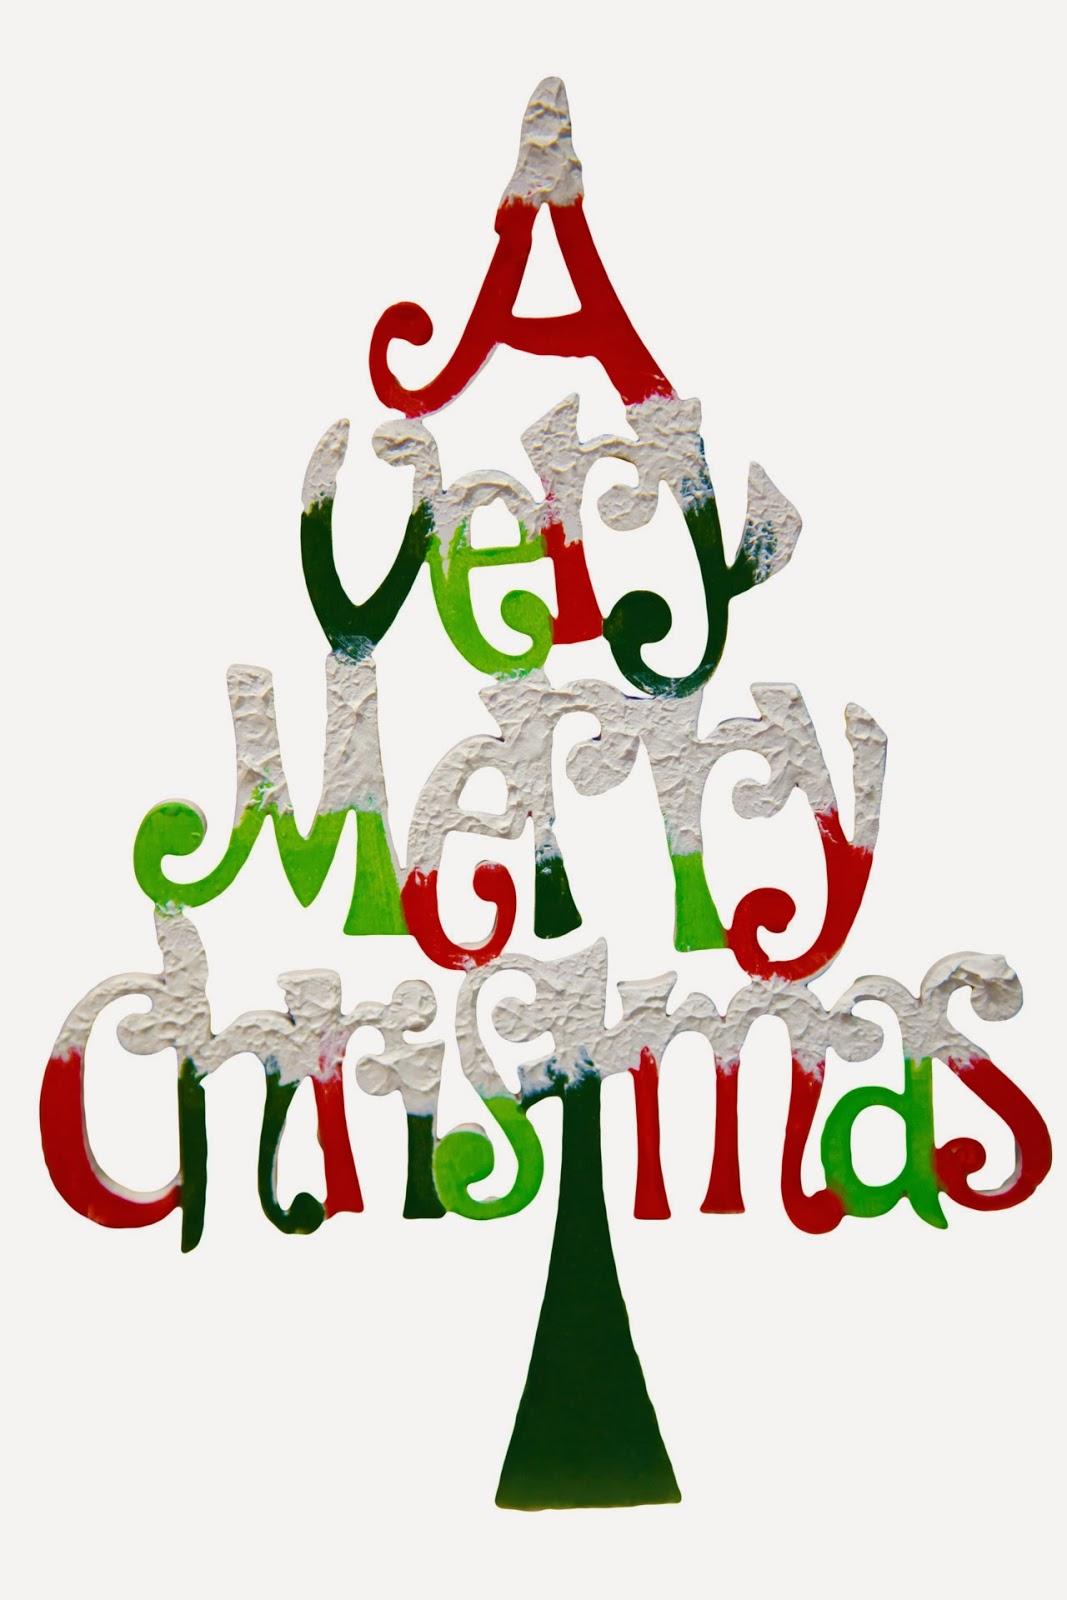 hight resolution of religious merry christmas clipart clipart library free clipart merry christmas 281 29 jpg